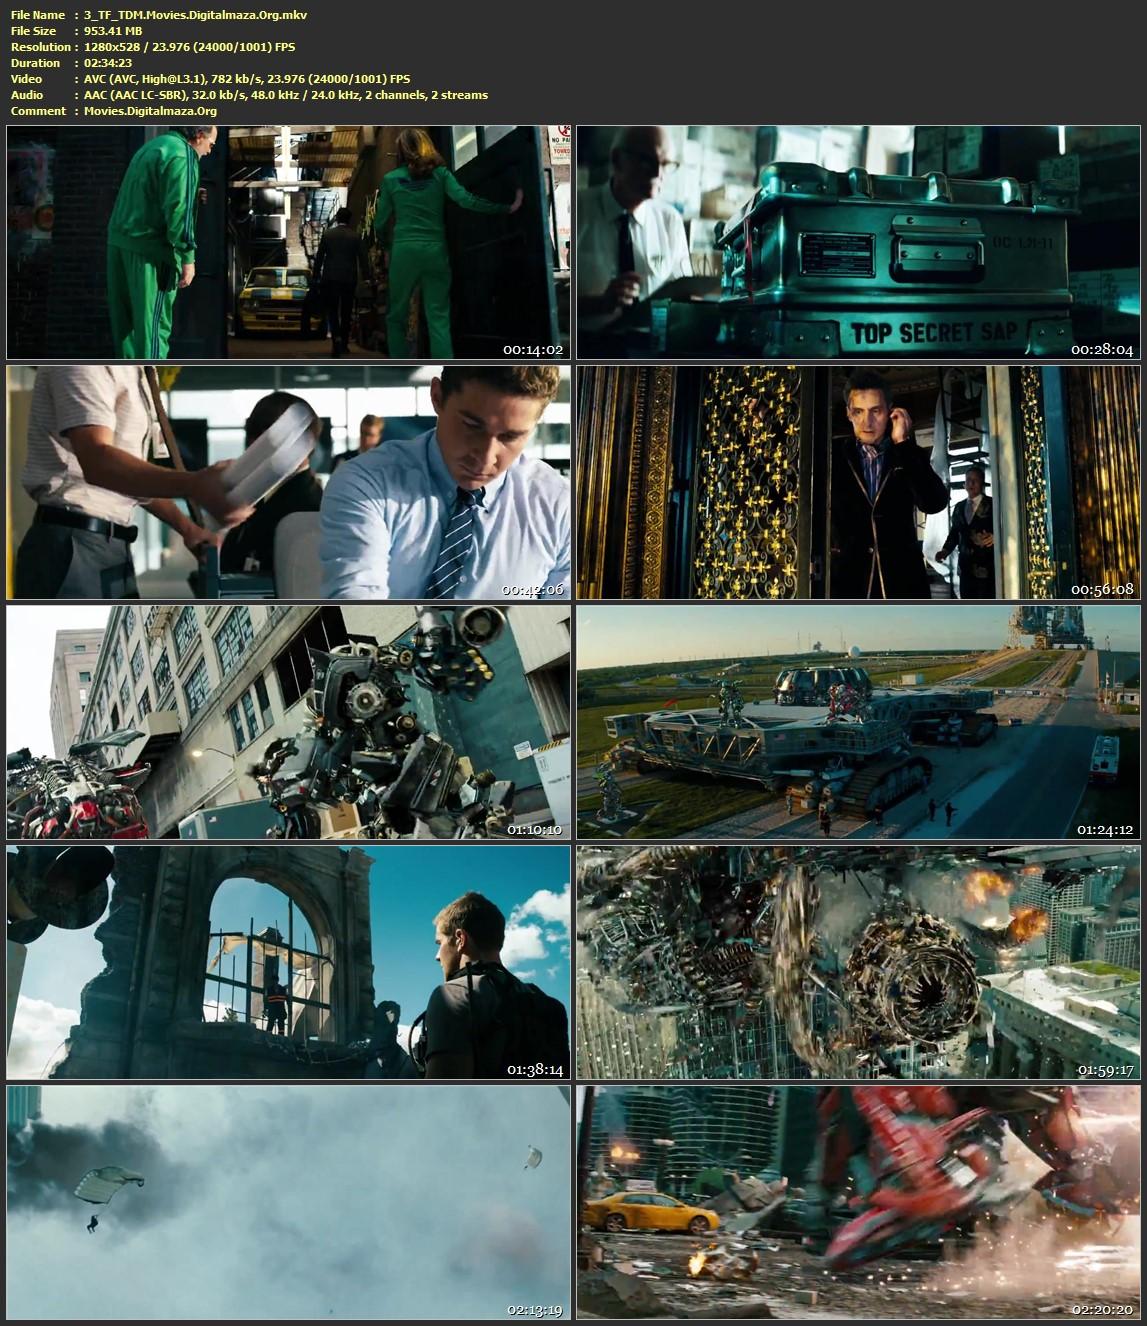 https://image.ibb.co/k9pW7c/3_TF_TDM_Movies_Digitalmaza_Org_mkv.jpg